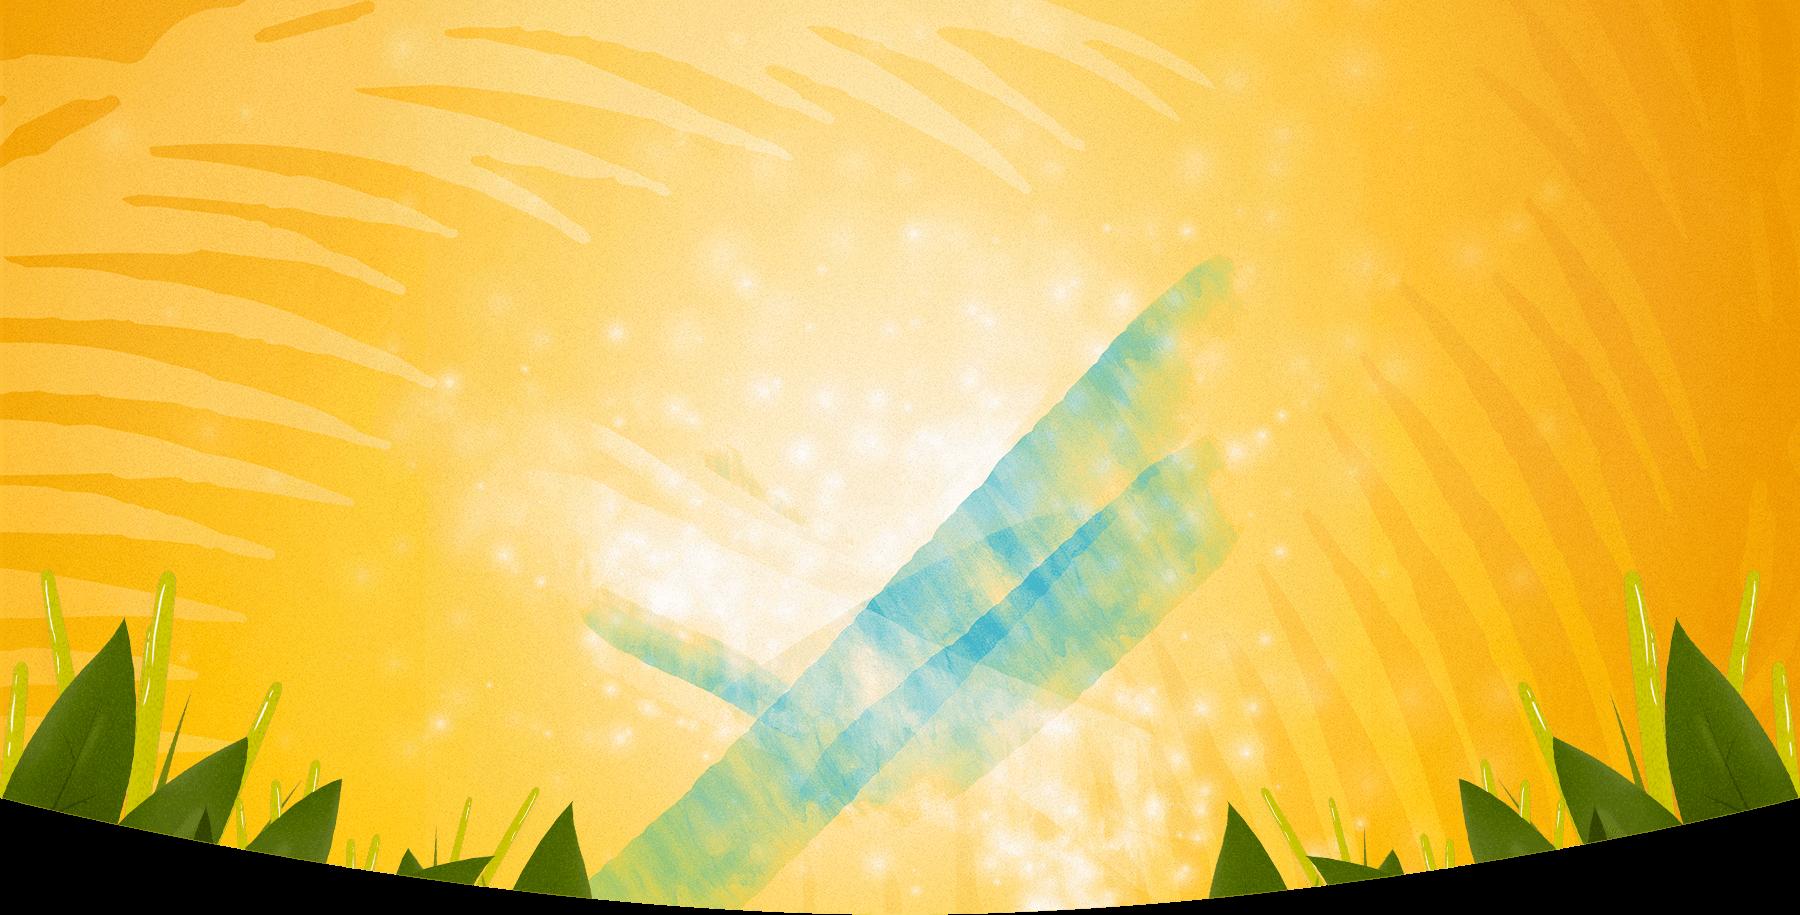 Negrita illustration background